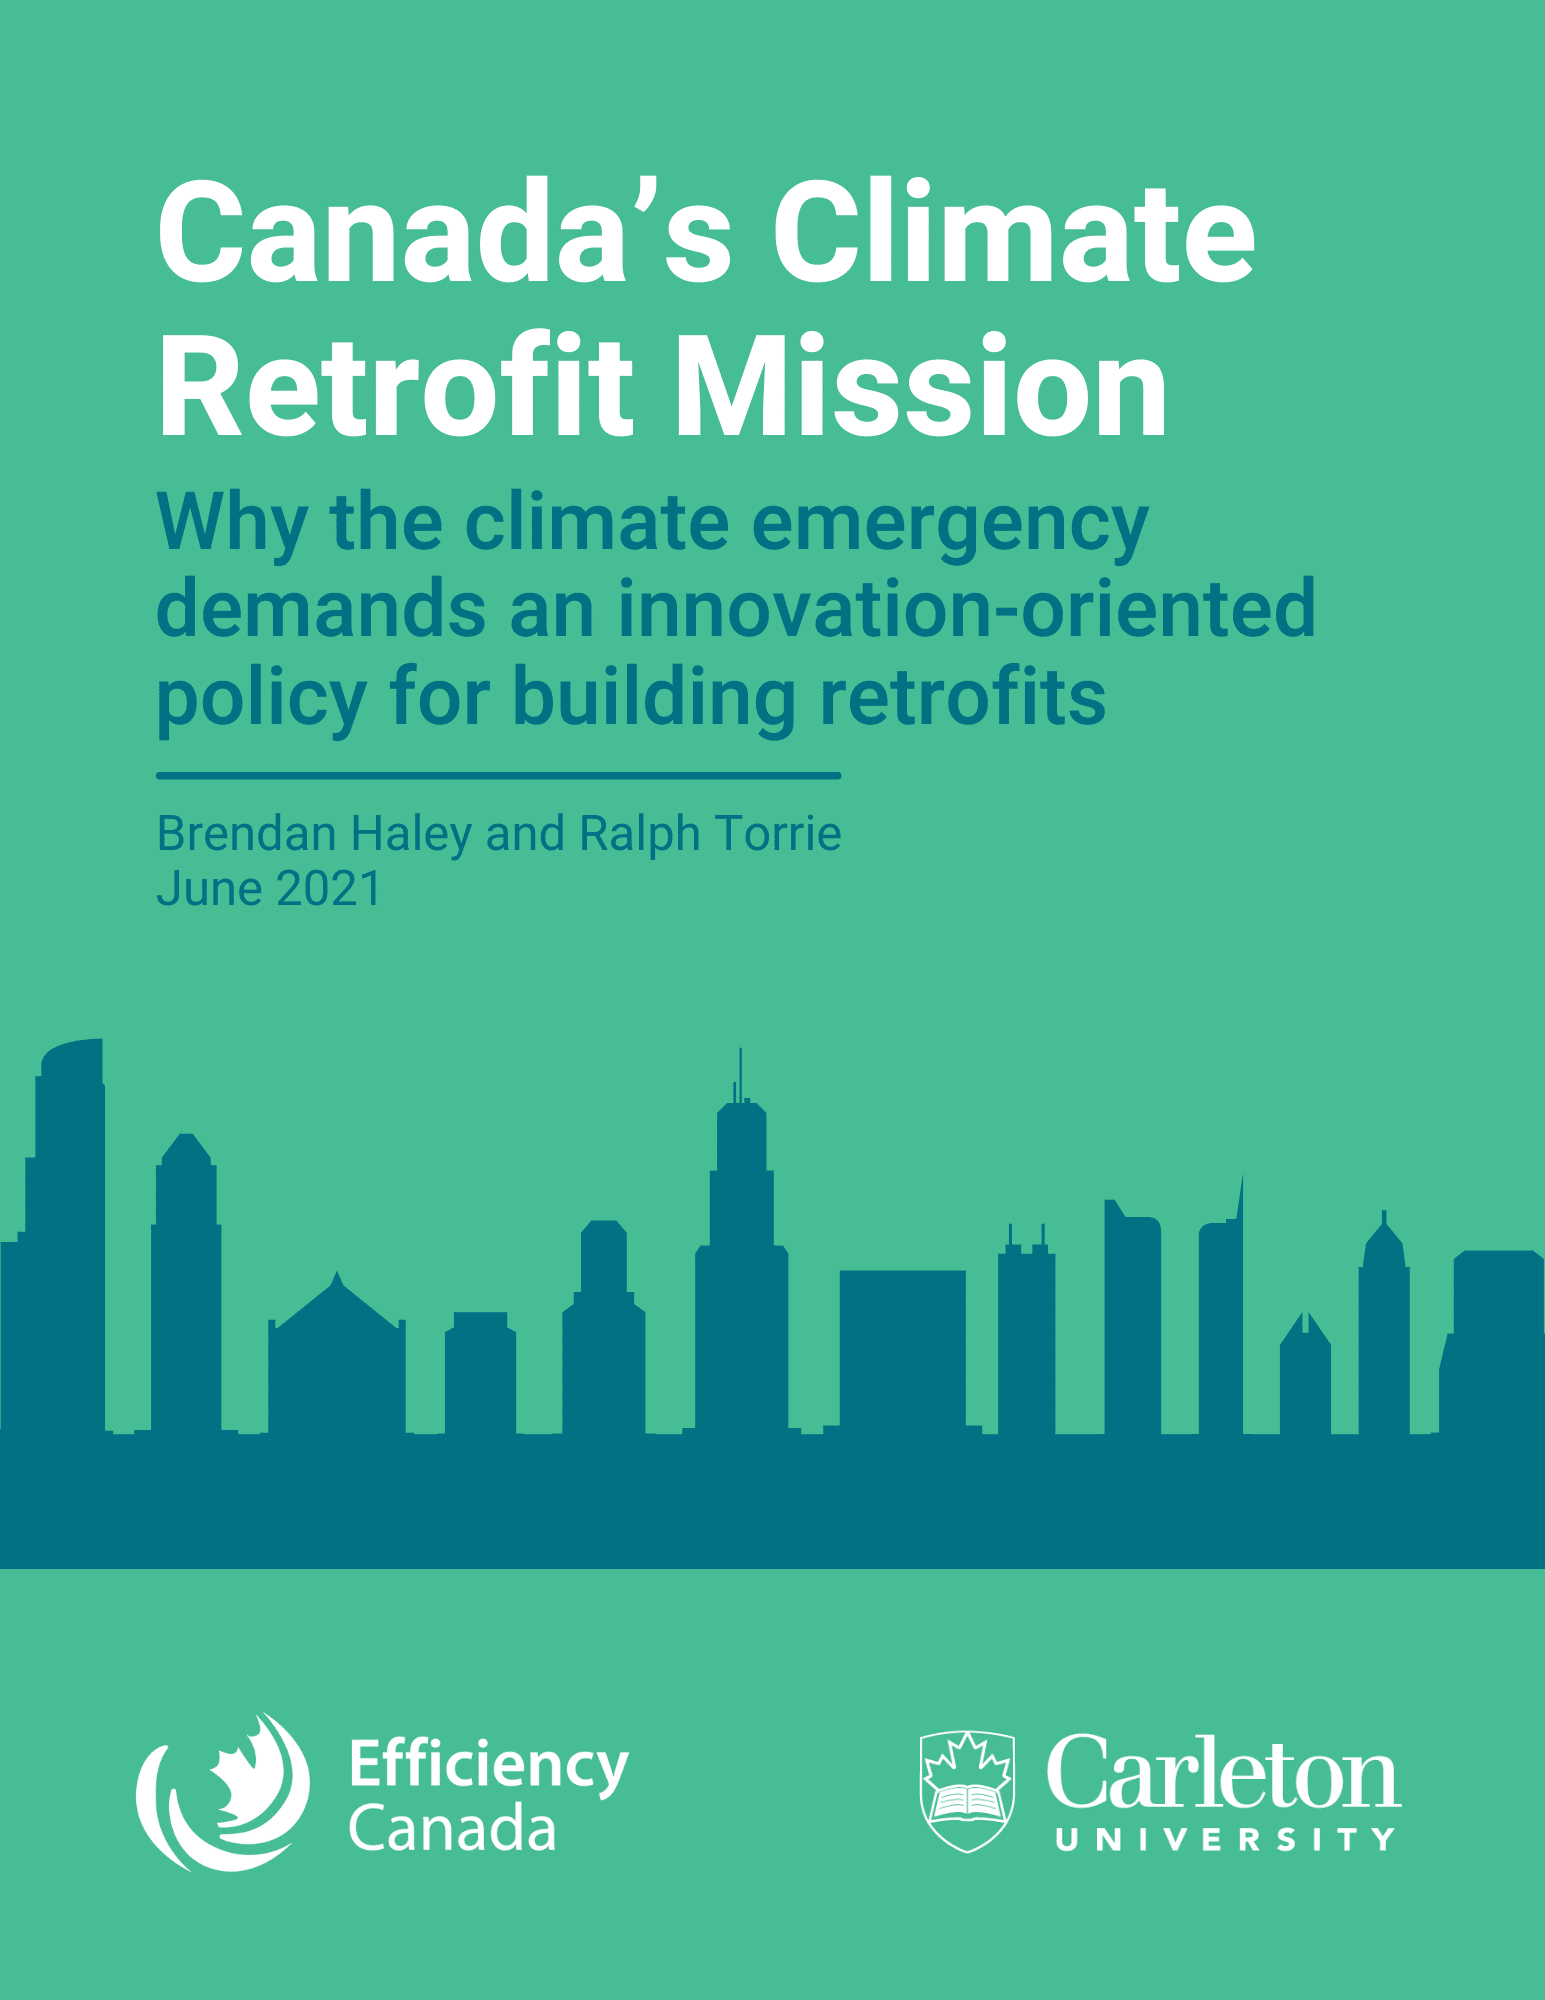 Canada's Climate Retrofit Mission